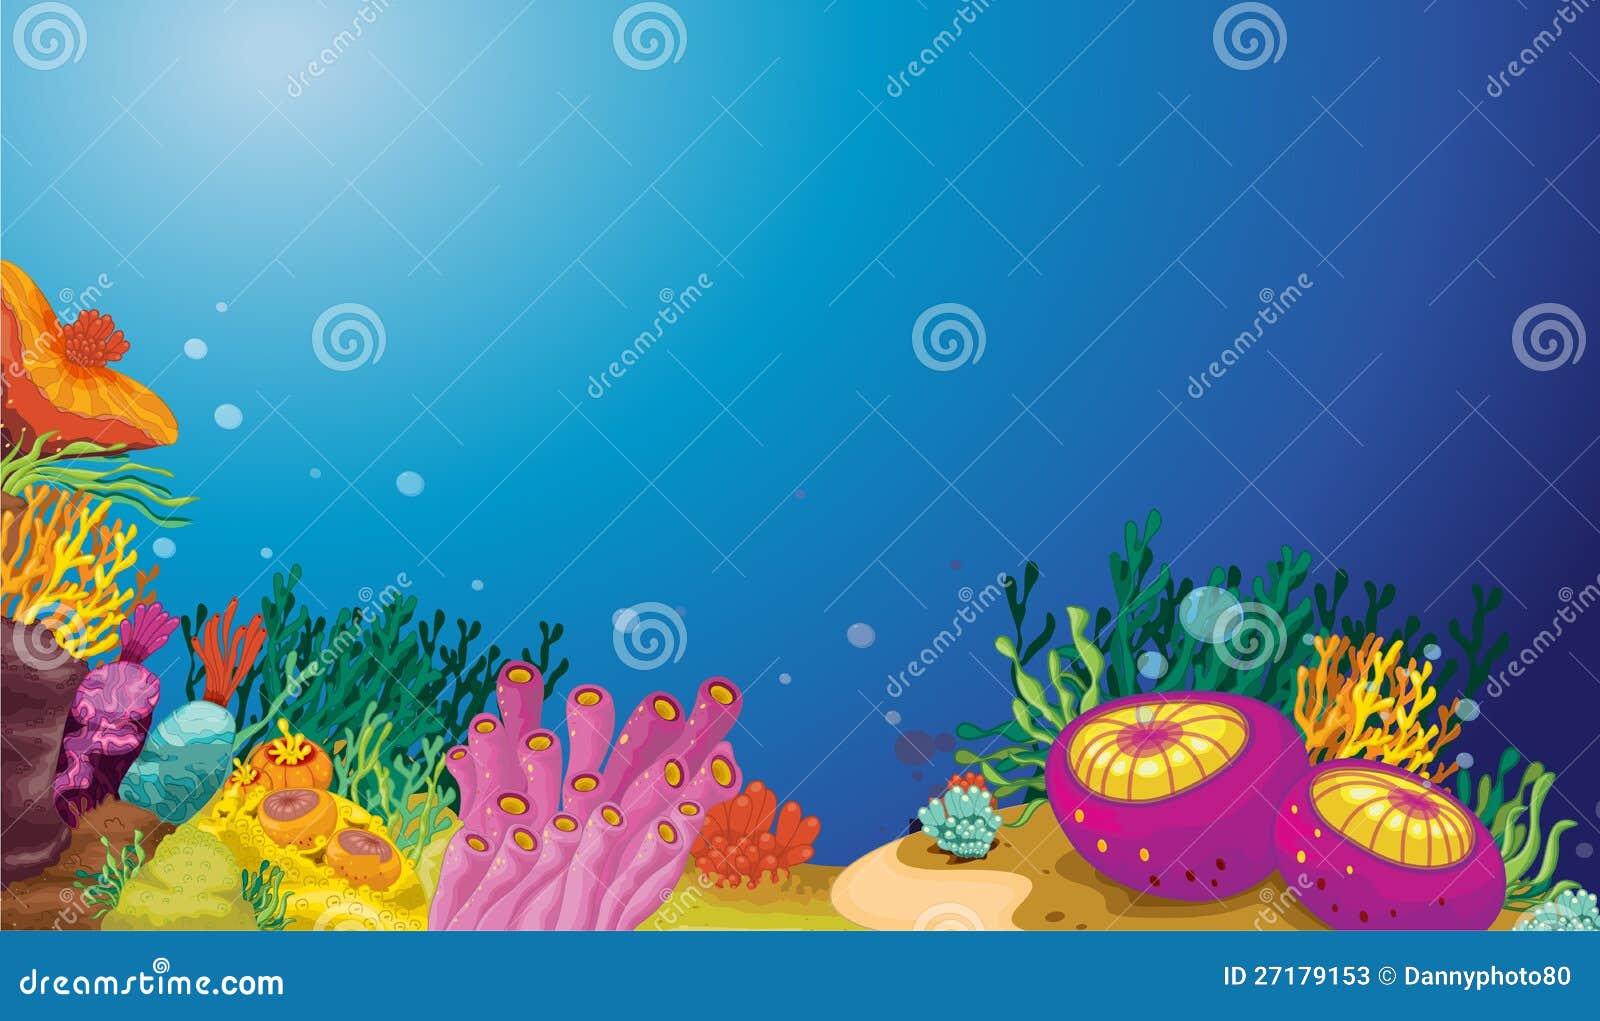 Underwater scene stock illustration. Illustration of ...